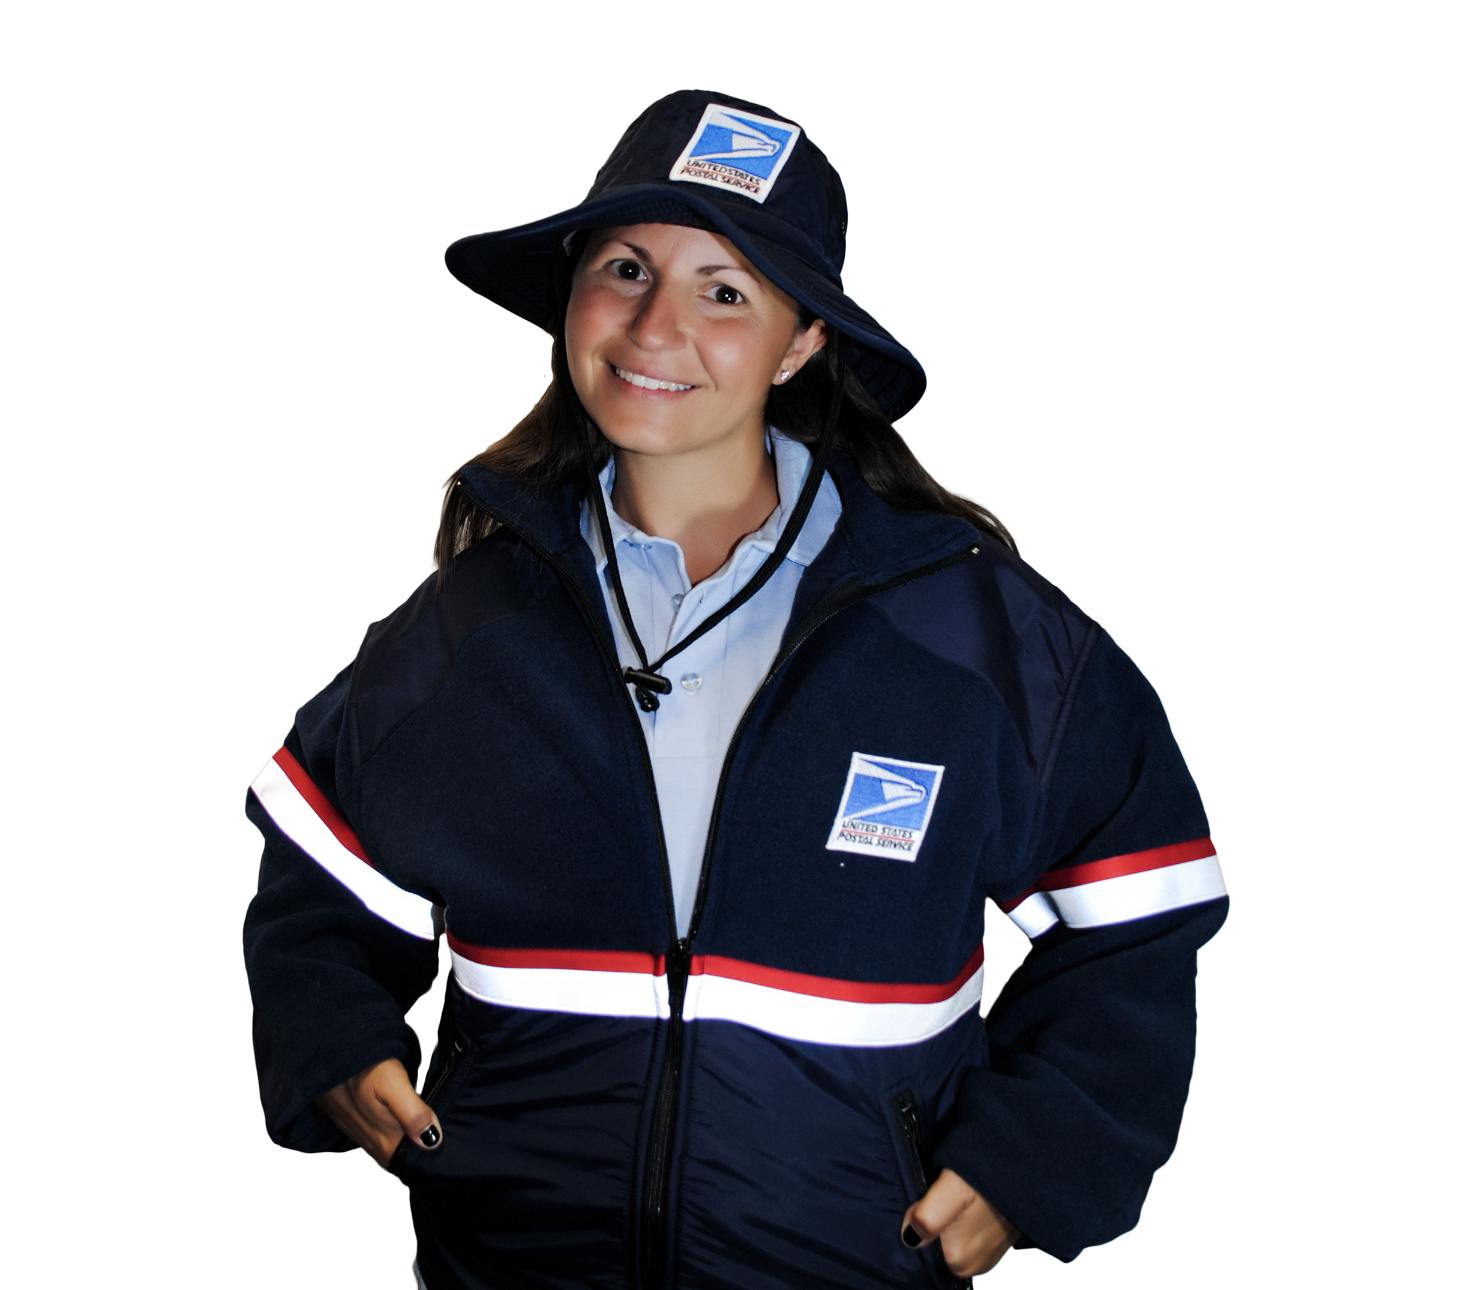 Postal Worker Uniform 87